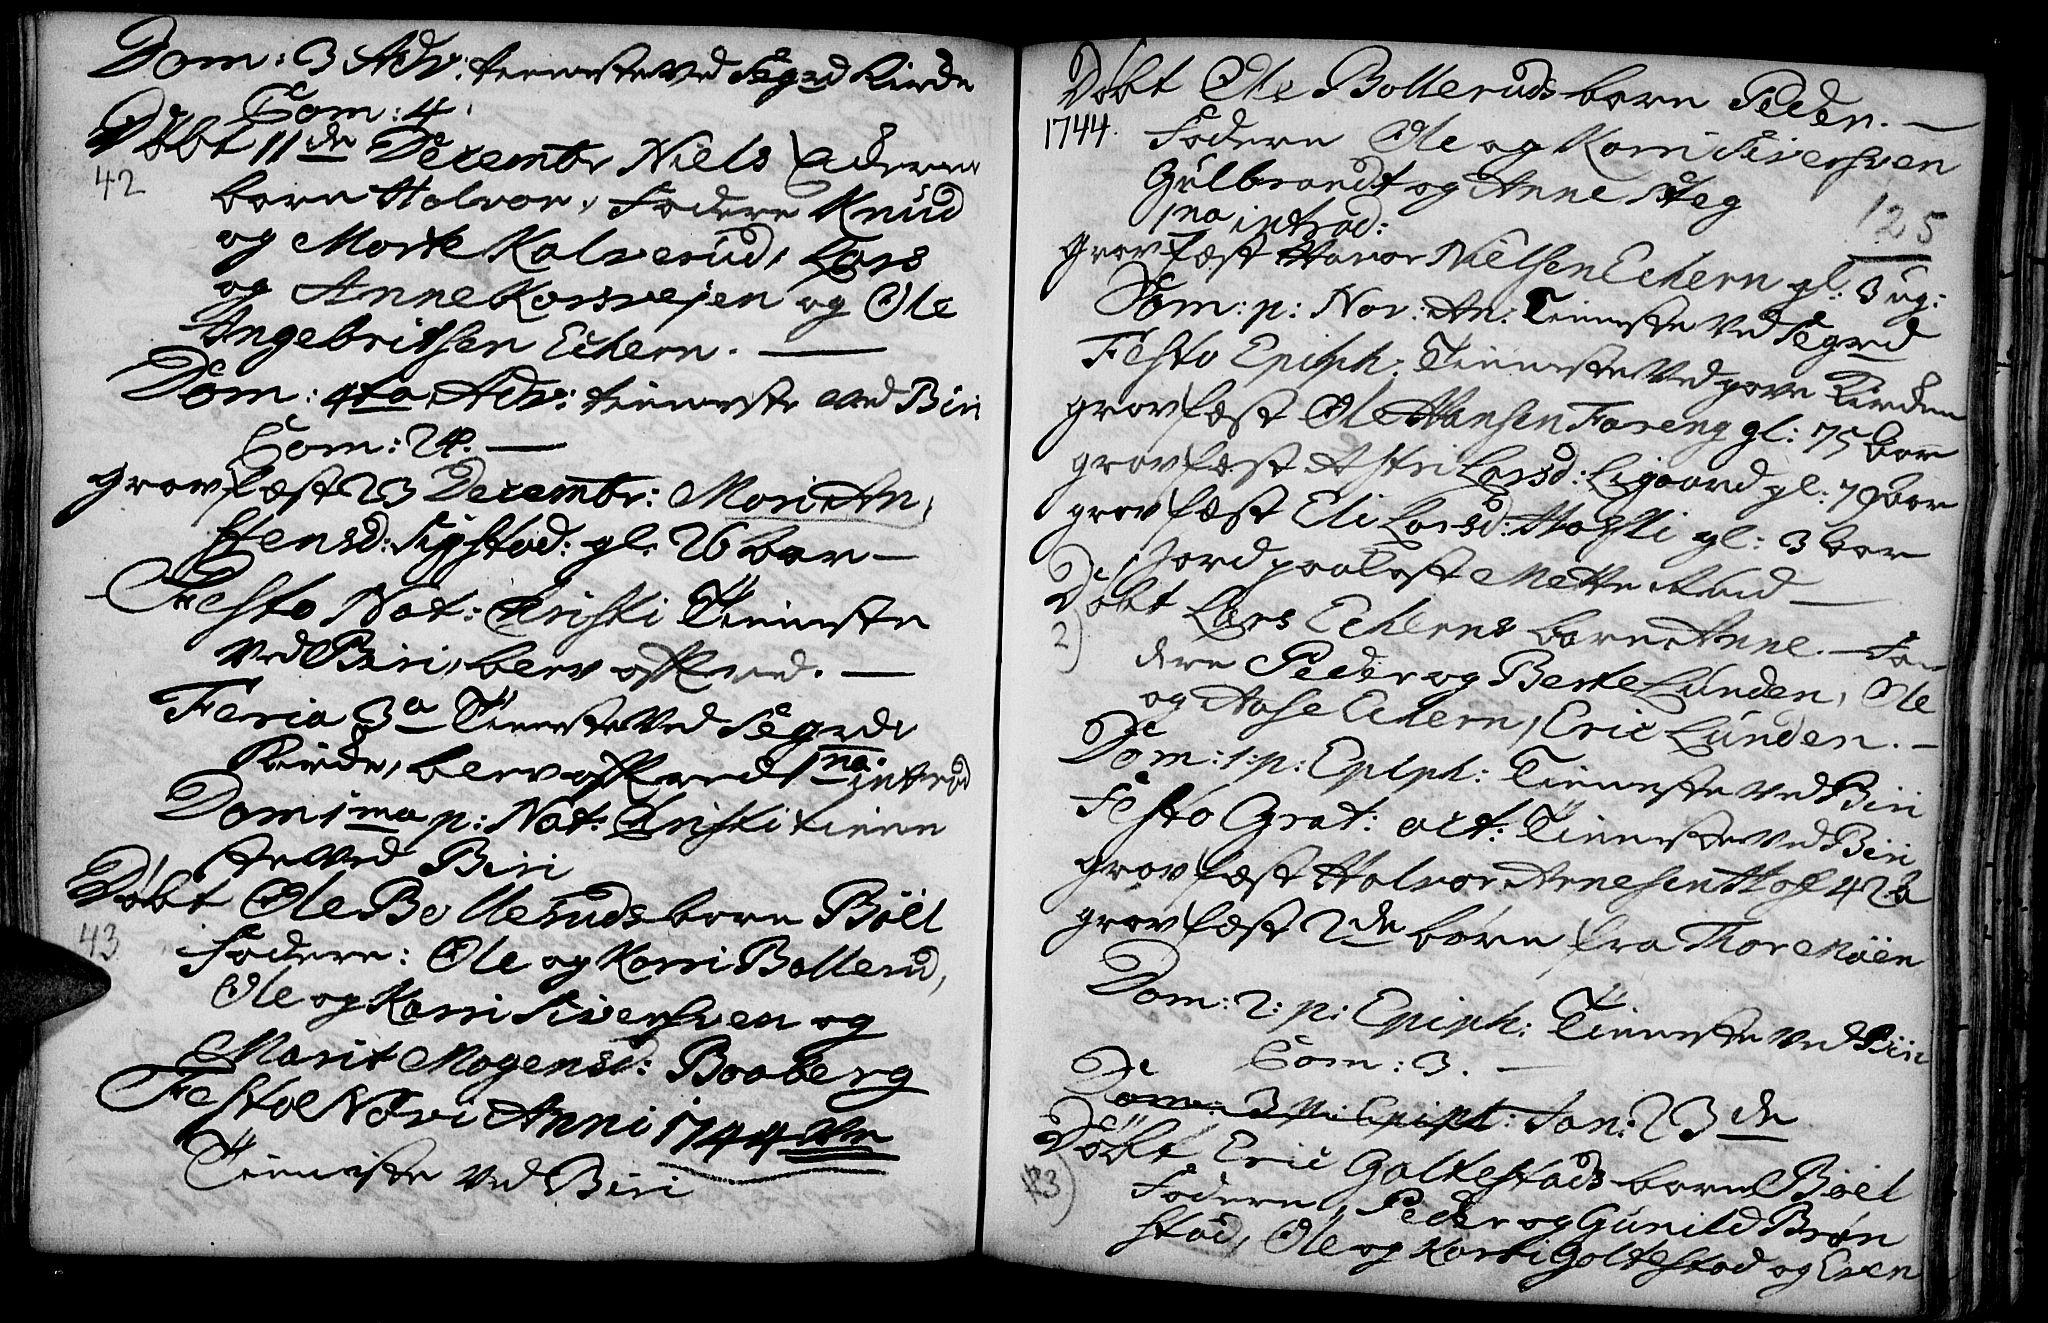 SAH, Biri prestekontor, Ministerialbok nr. 1, 1730-1754, s. 125